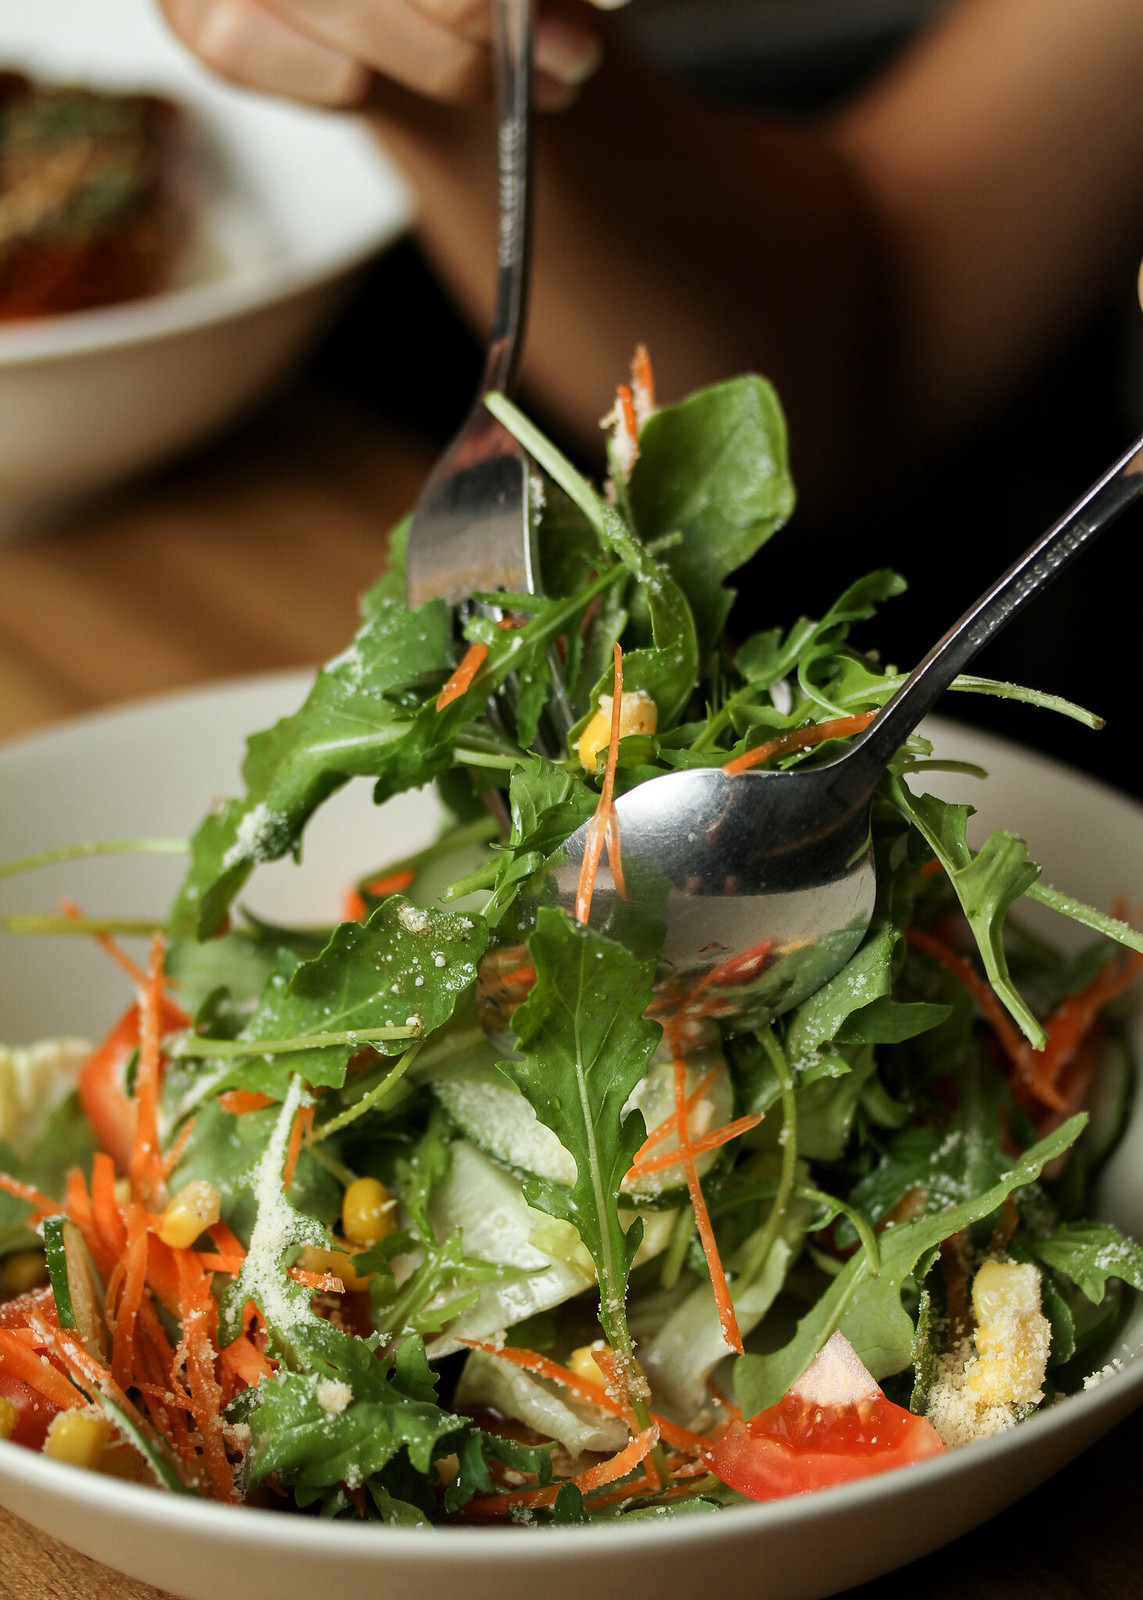 Daily Affairs Salad - Toss